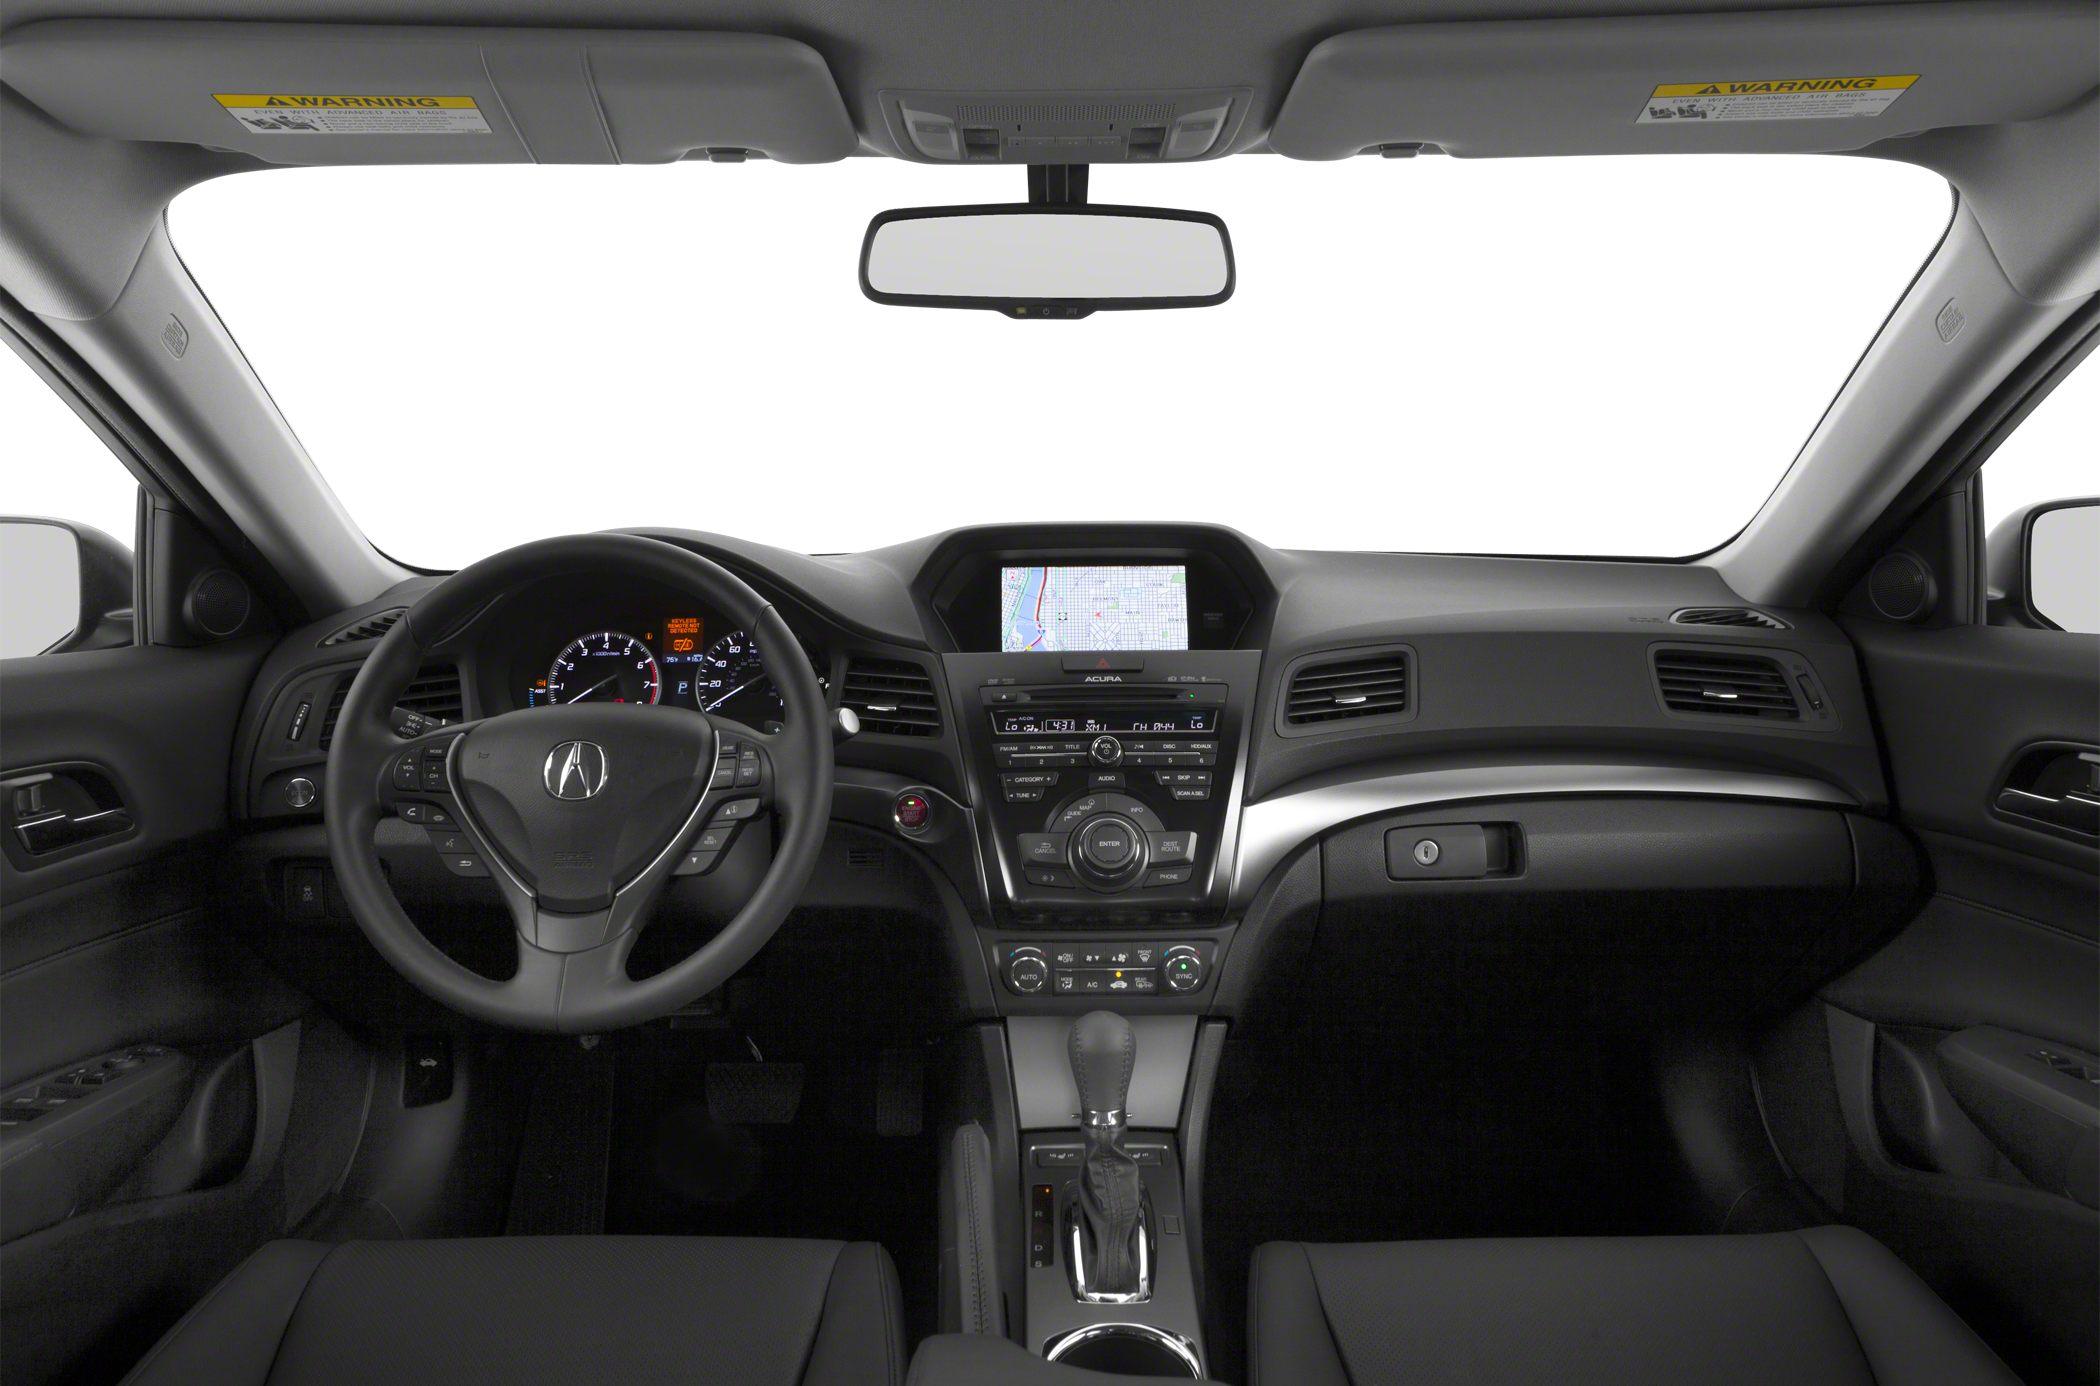 2014 Acura ILX Hybrid Interior